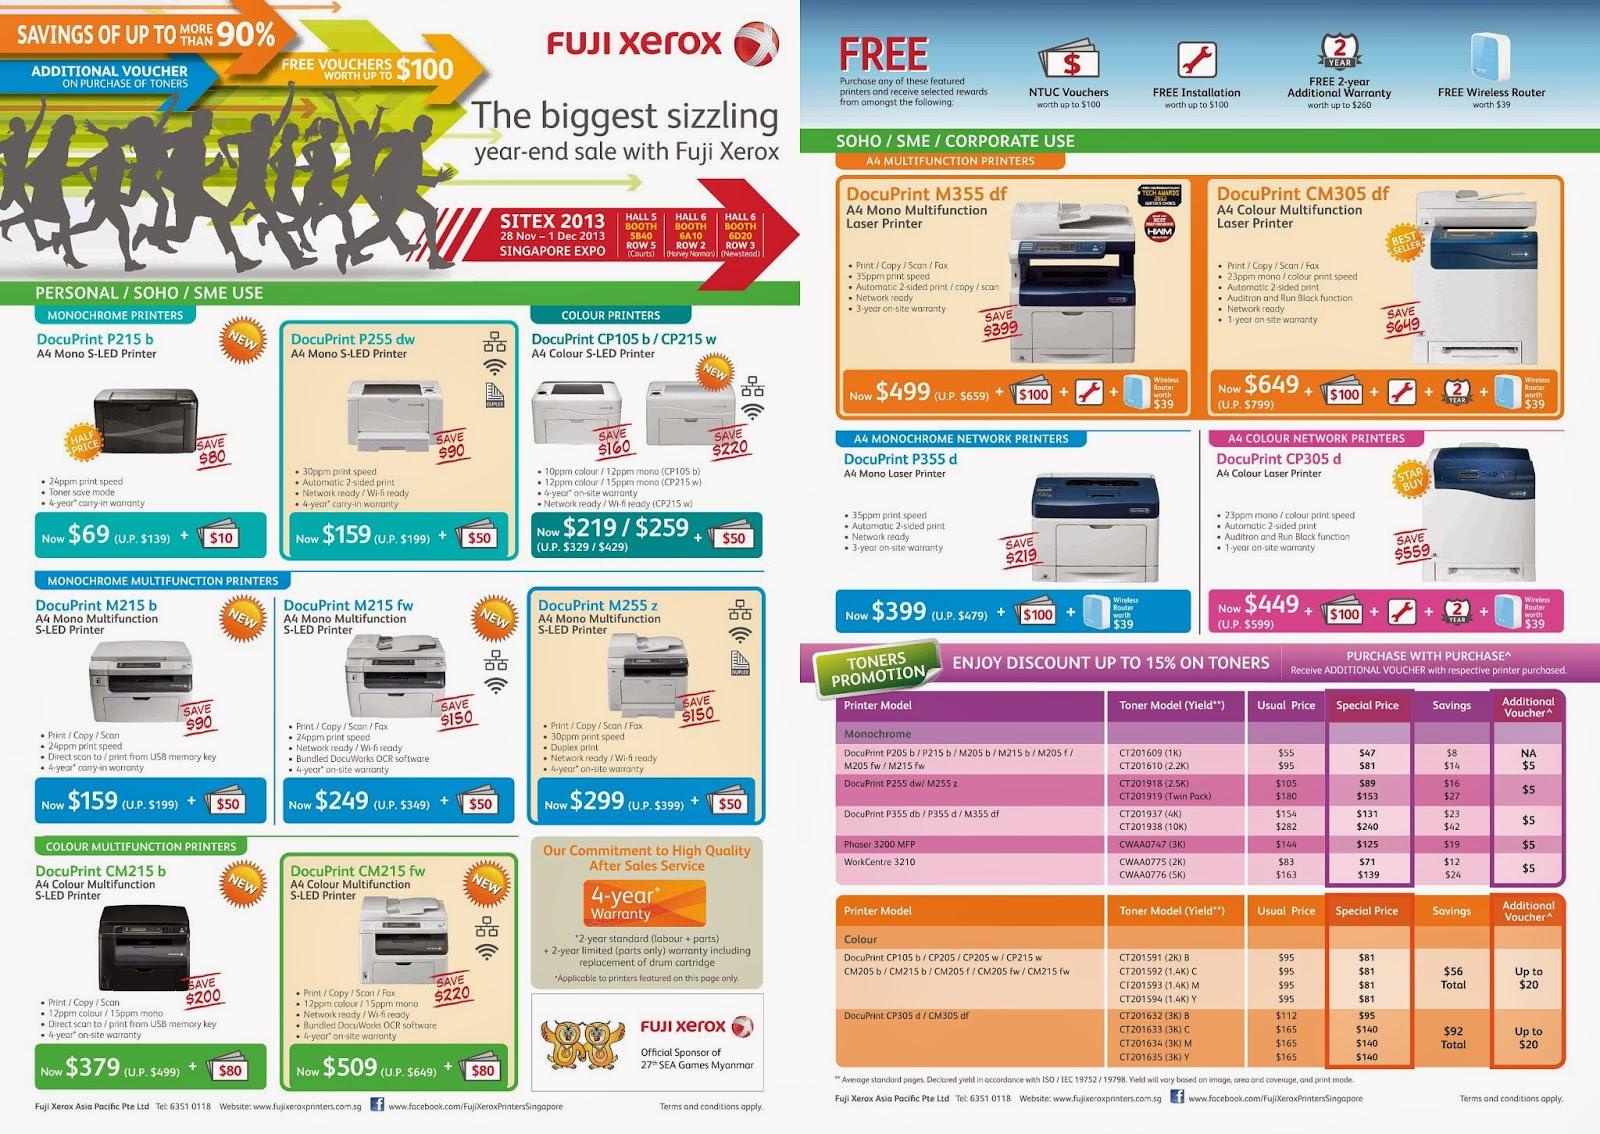 SITEX 2013 - Fuji Xerox Printers' Promotional Flyers - The Tech